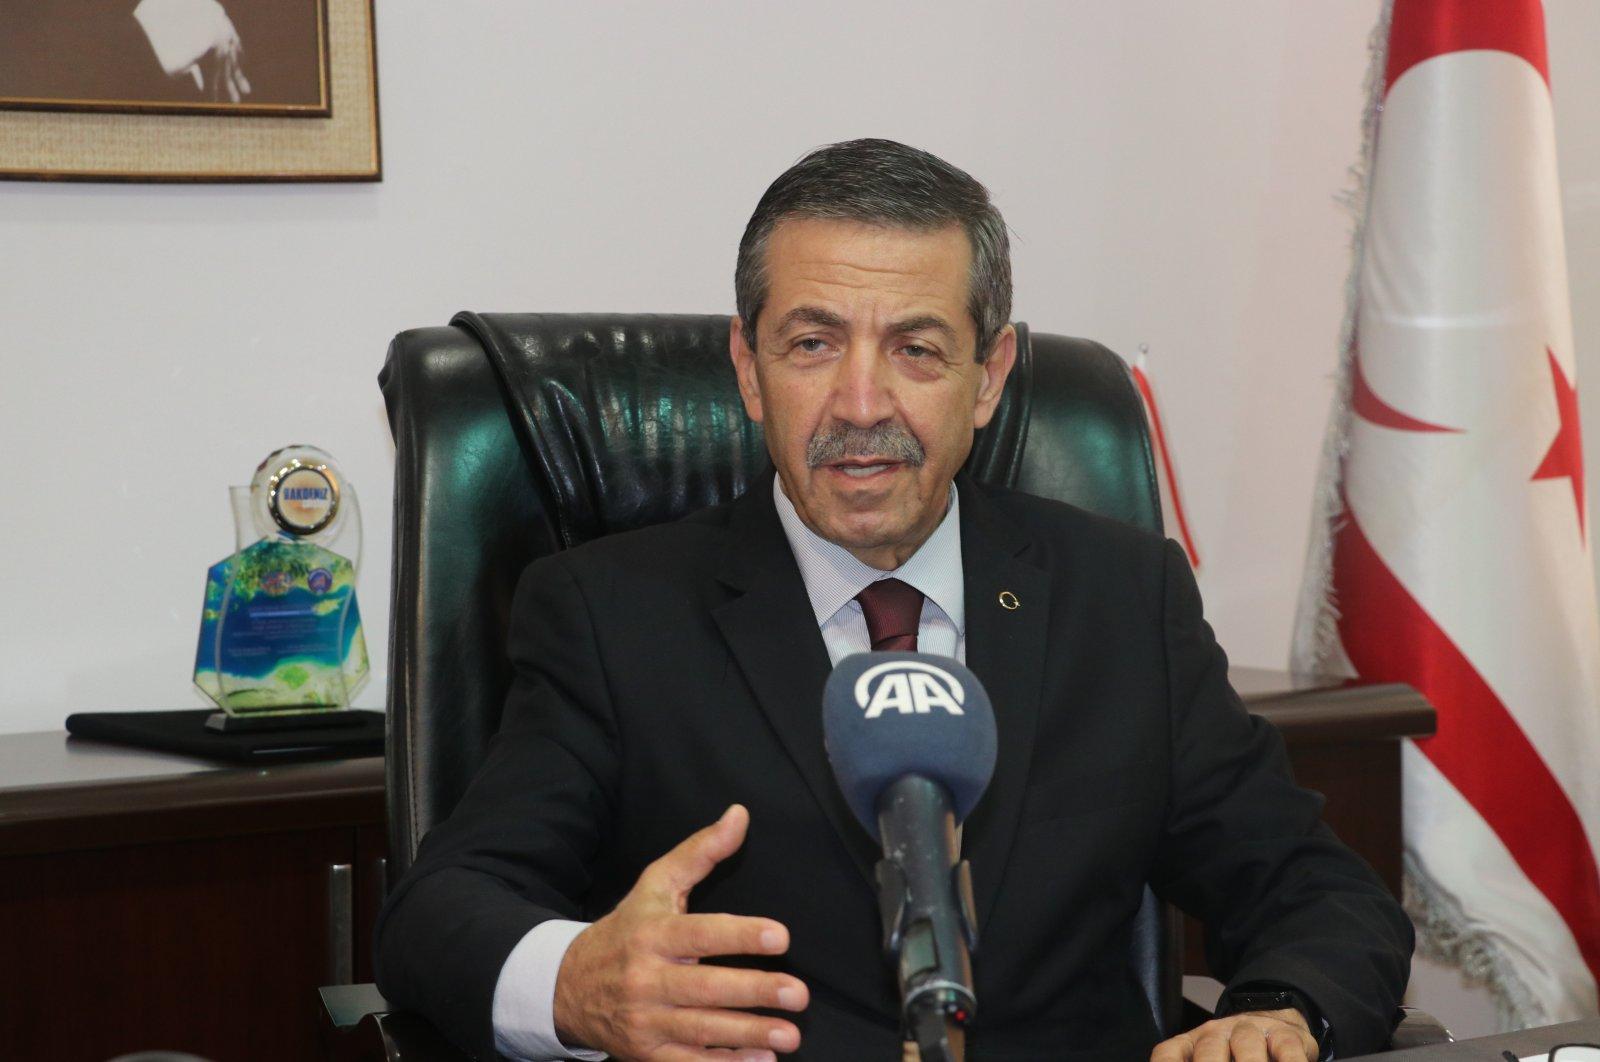 Tahsin Ertuğruloğlu speaks to Anadolu Agency in his office in Lefkoşa (Nicosia), Turkish Republic of Northern Cyprus (TRNC), Dec. 23, 2020. (AA)